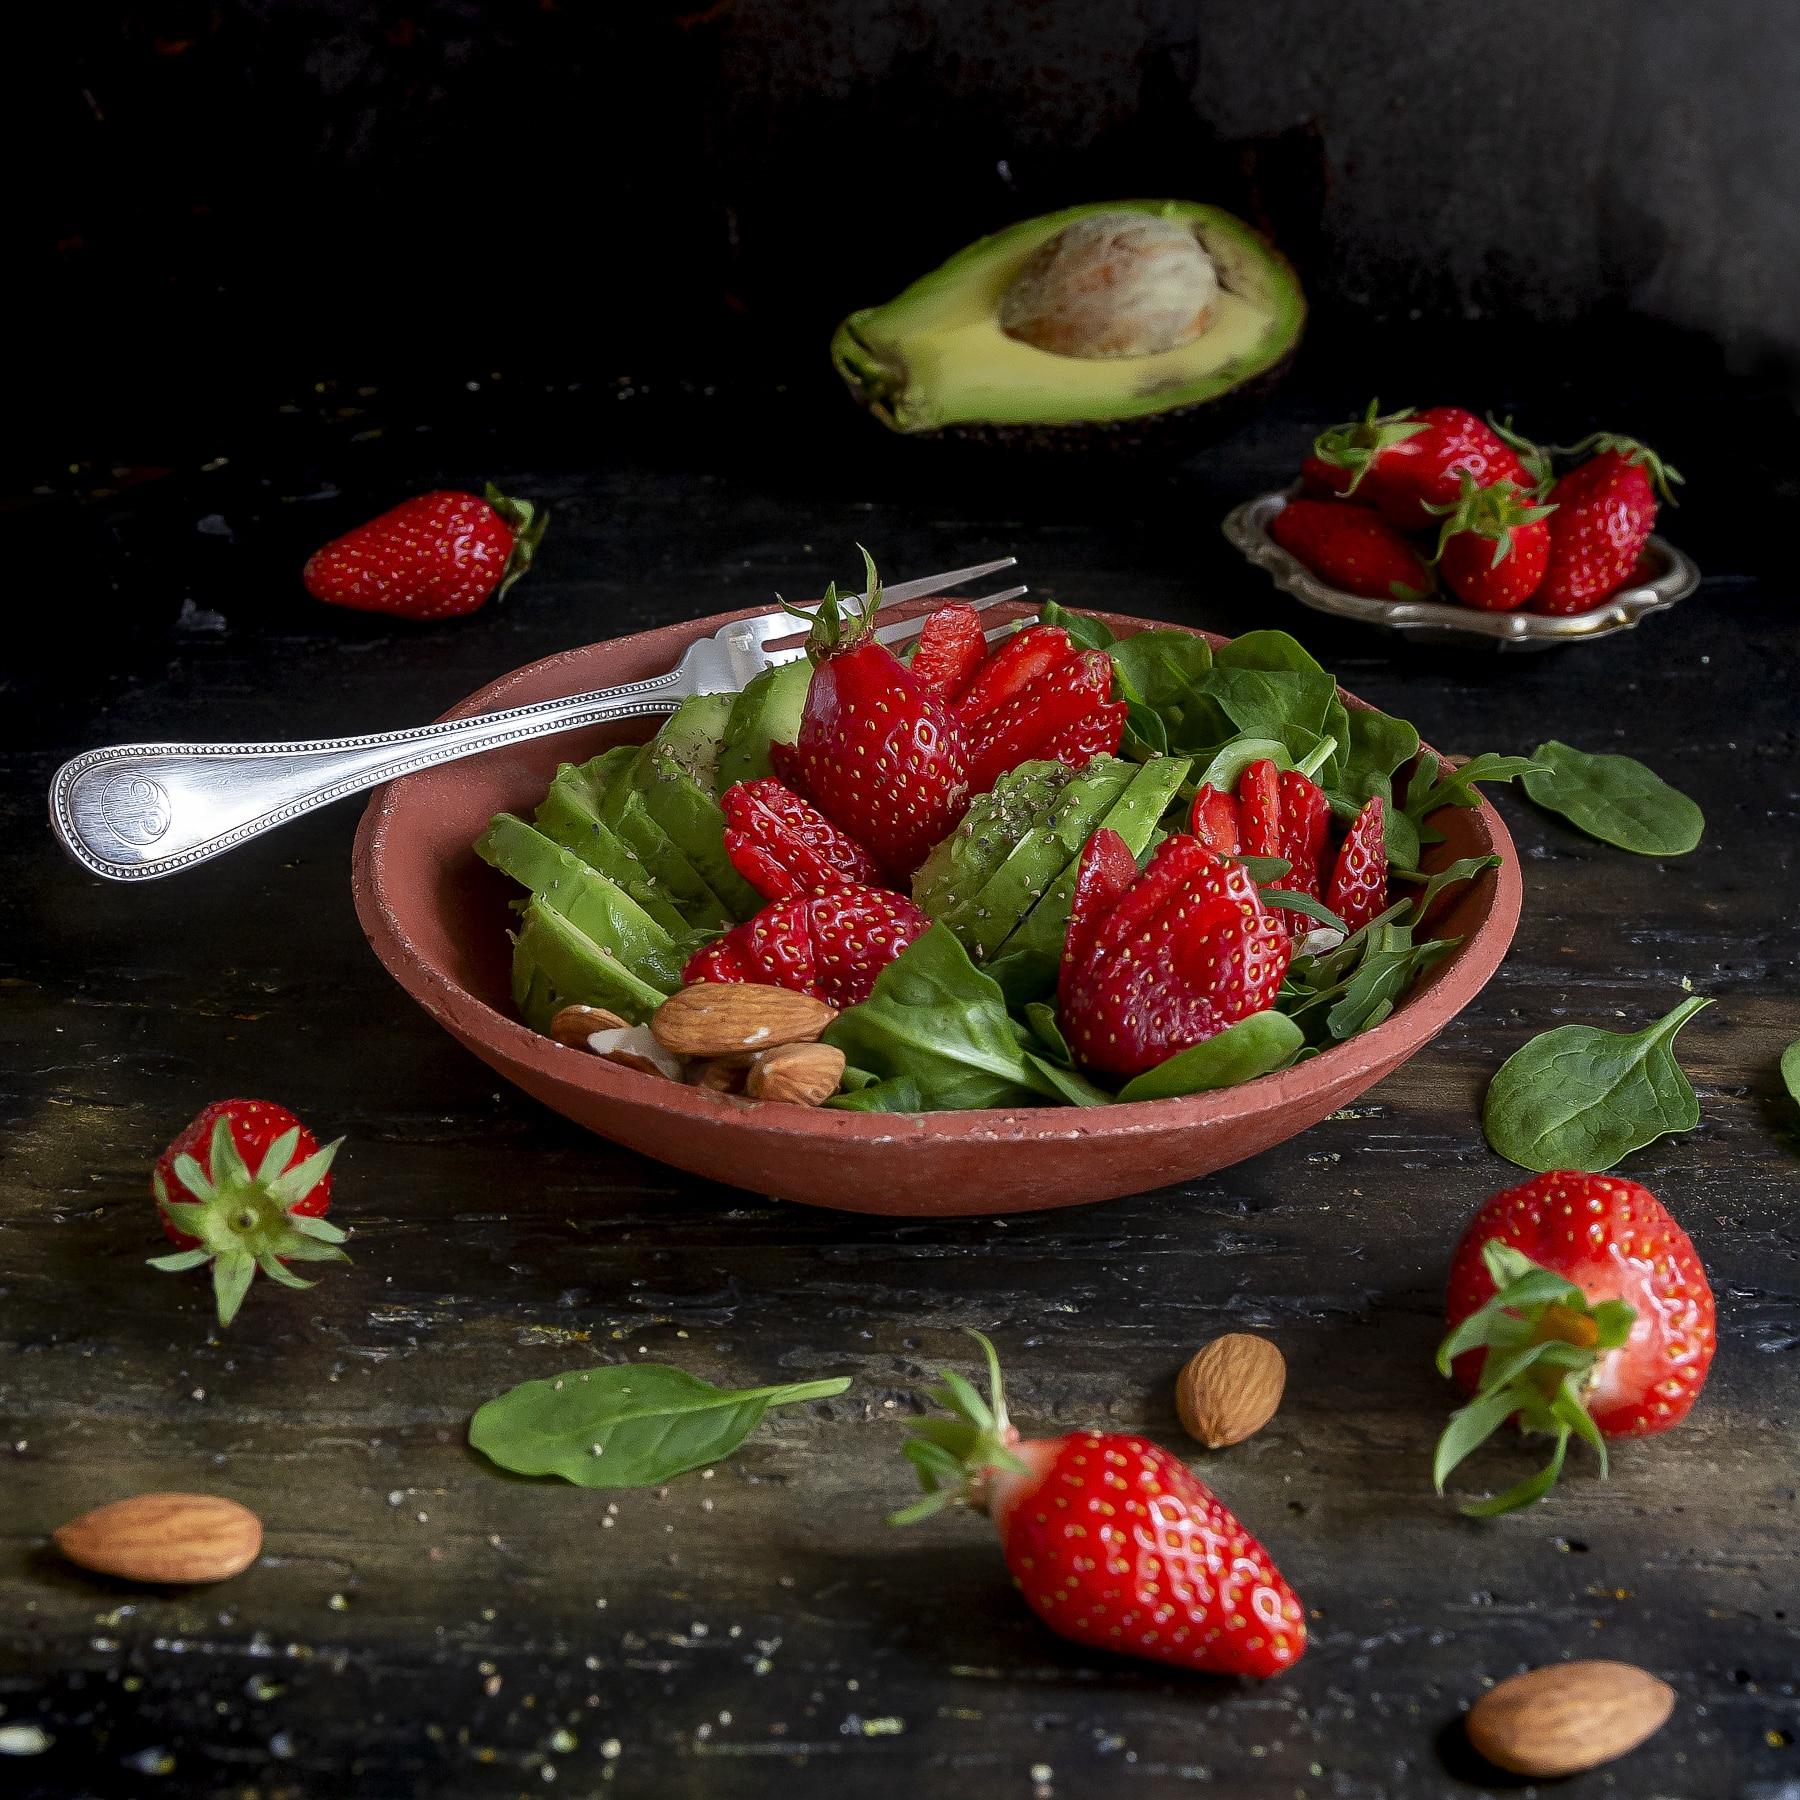 fragole-ricetta-insalata-con-avocado-spinacini-mandorle-rucola-ricetta-facile-veloce-light-vegetariana-contemporaneo-food